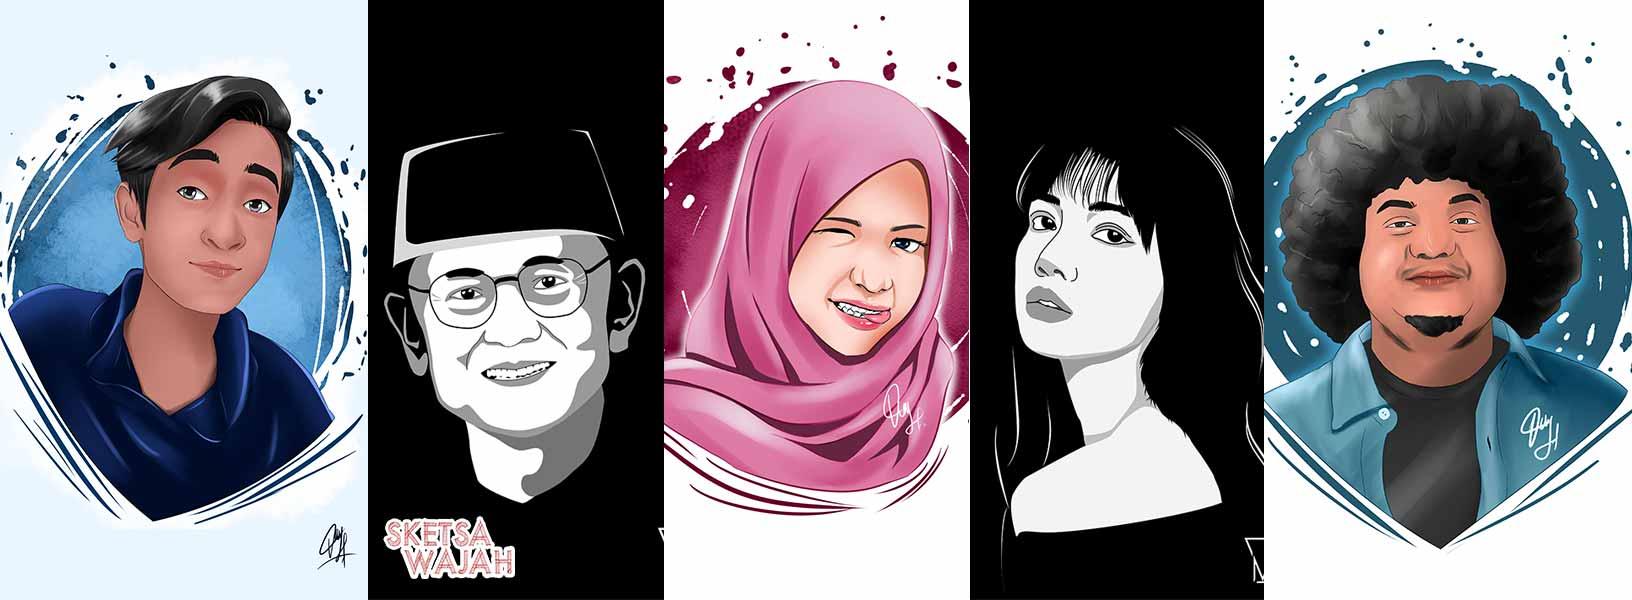 Karya Vicky Fajar sketcher Sketsa Wajah